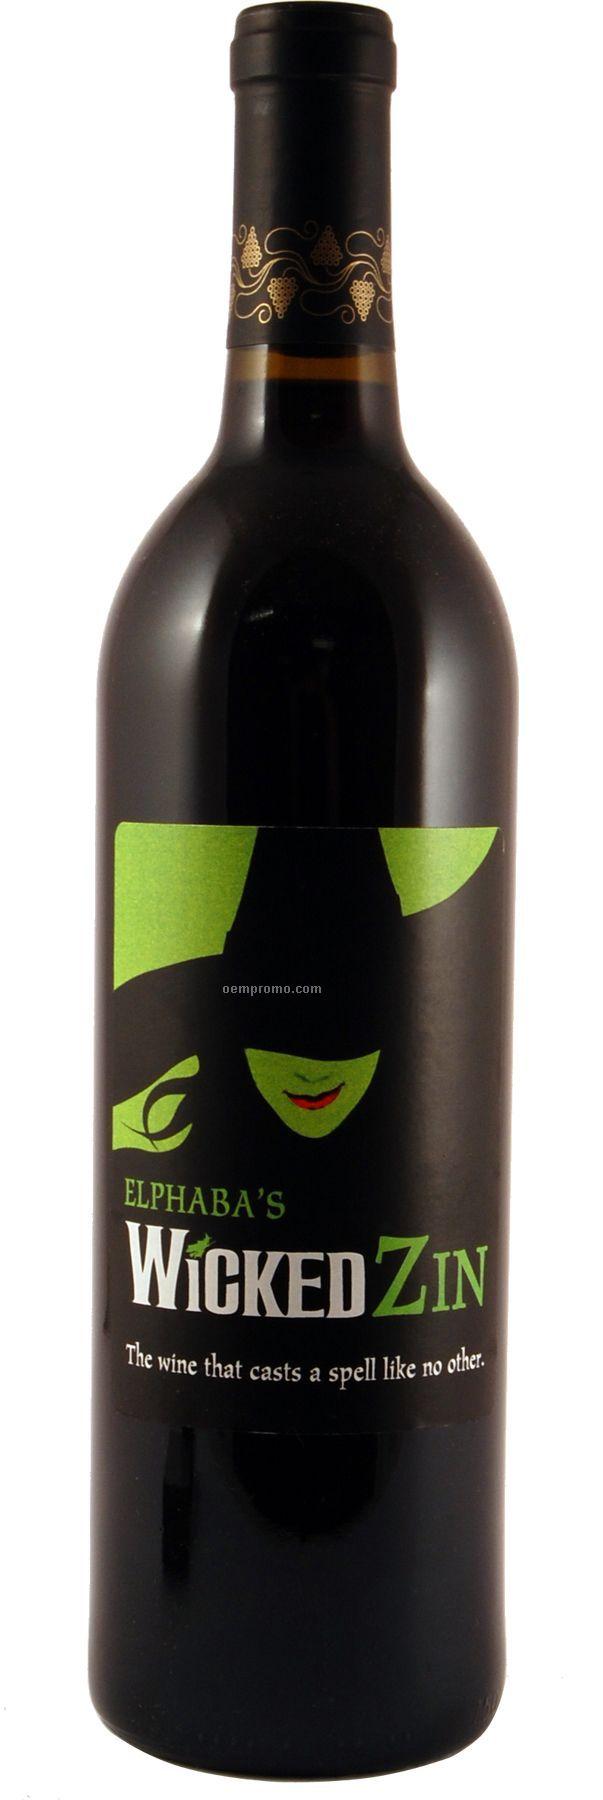 2007 Wv Zinfandel, Sonoma County Private Reserve (Custom Labeled Wine)